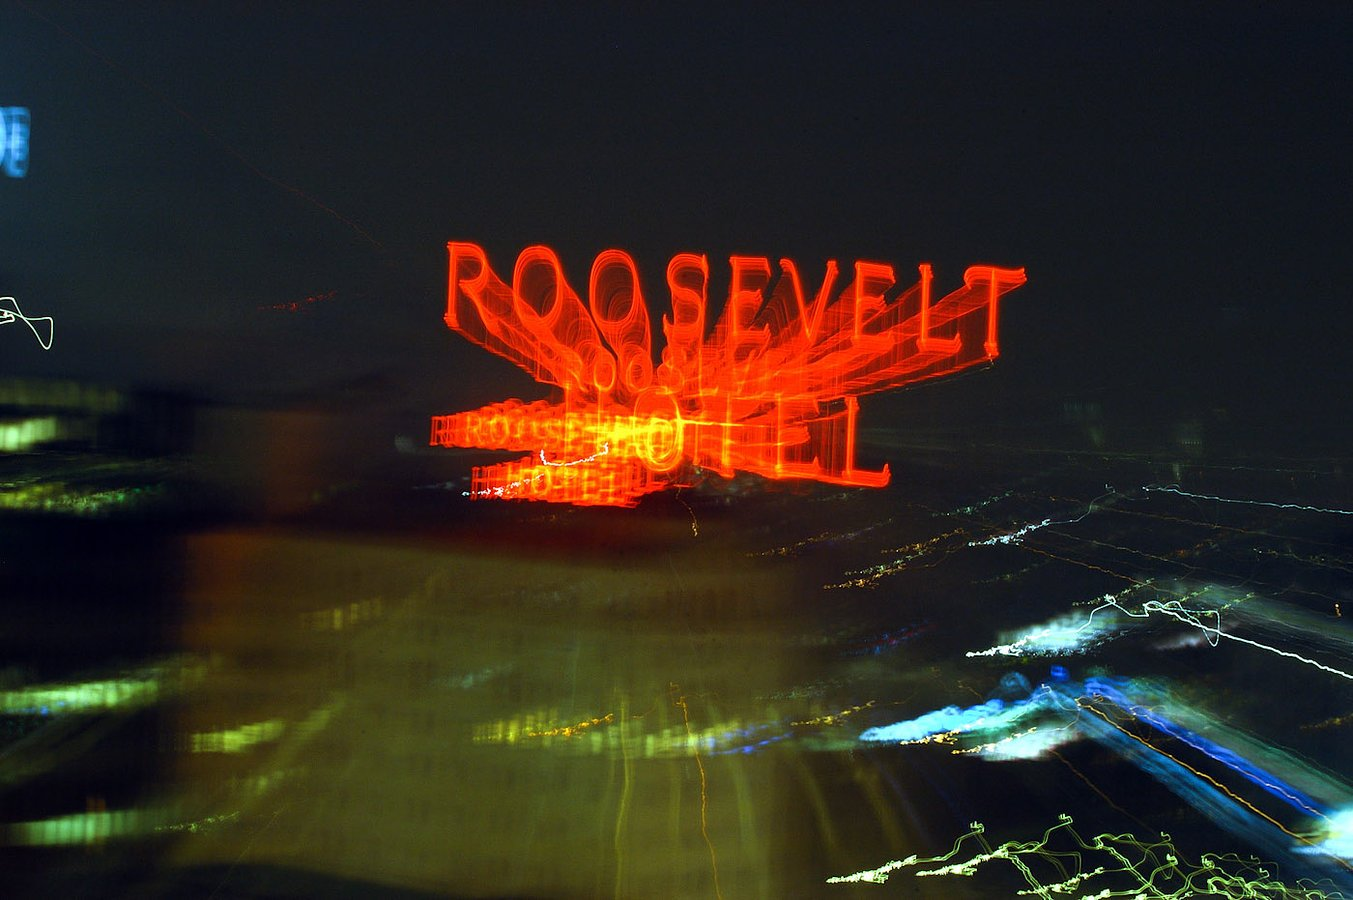 Roosevelt Hotel, Hollywood